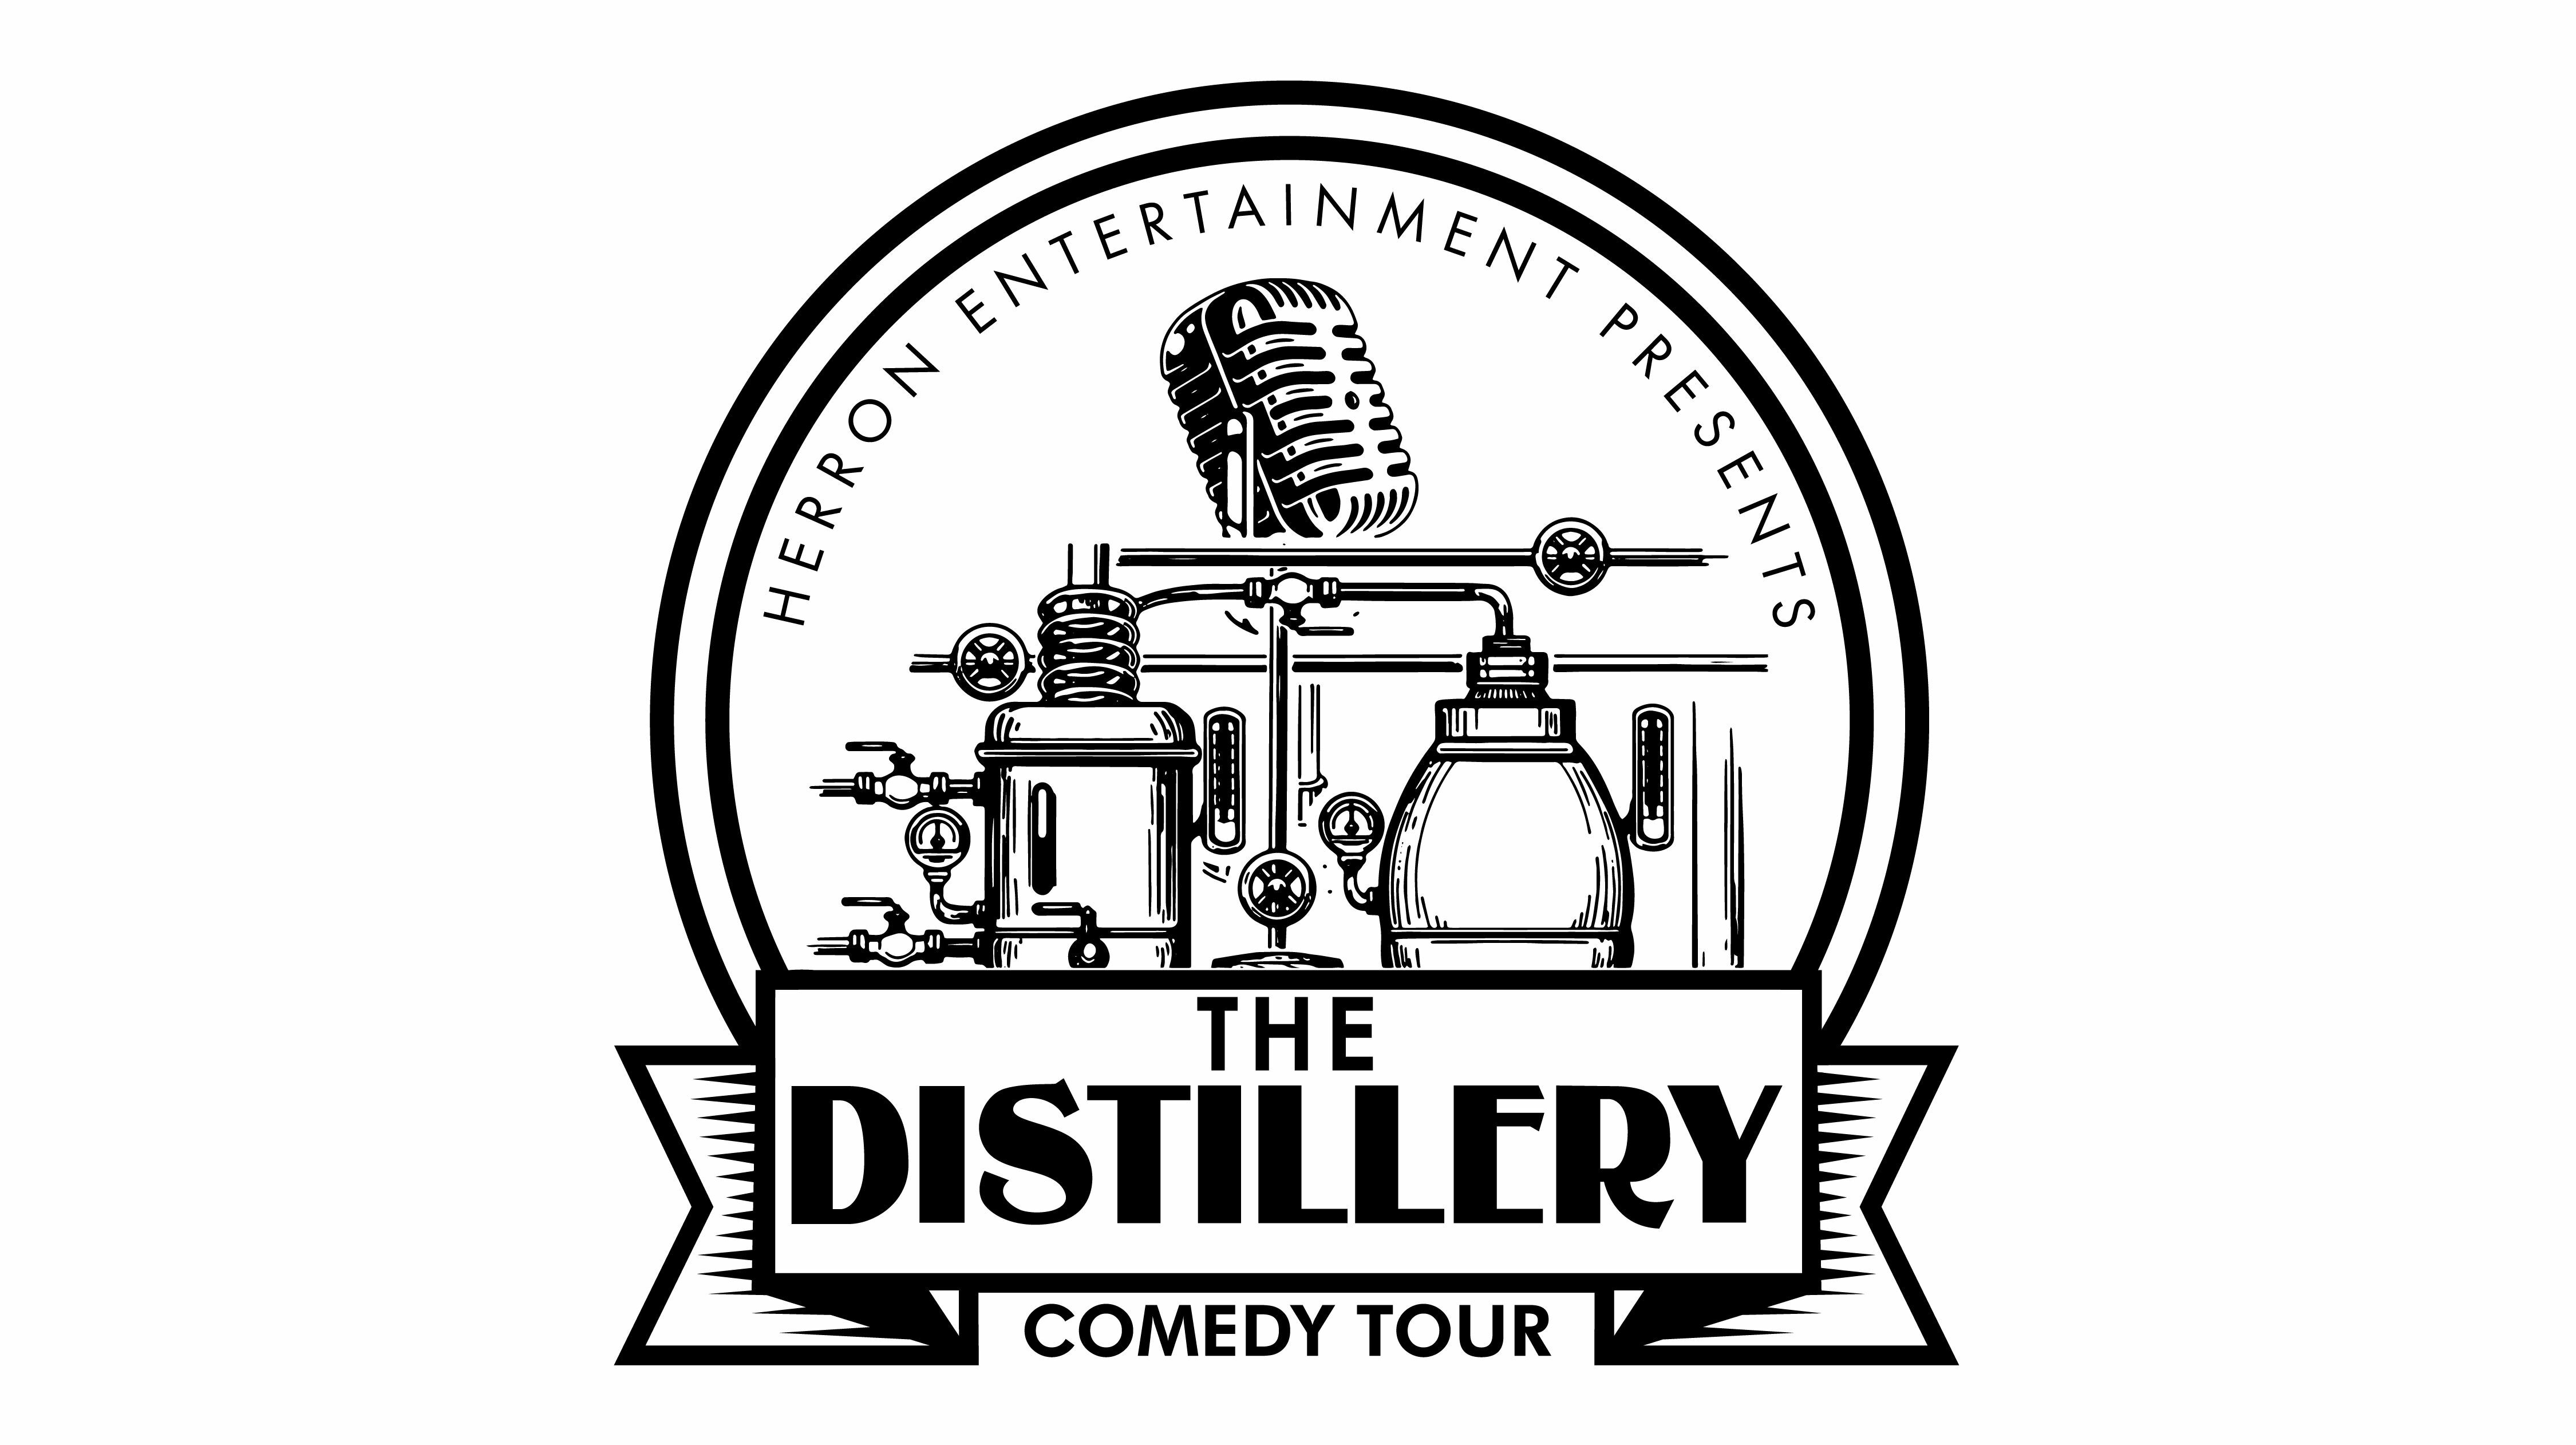 the DISTILLERY COMEDY TOUR